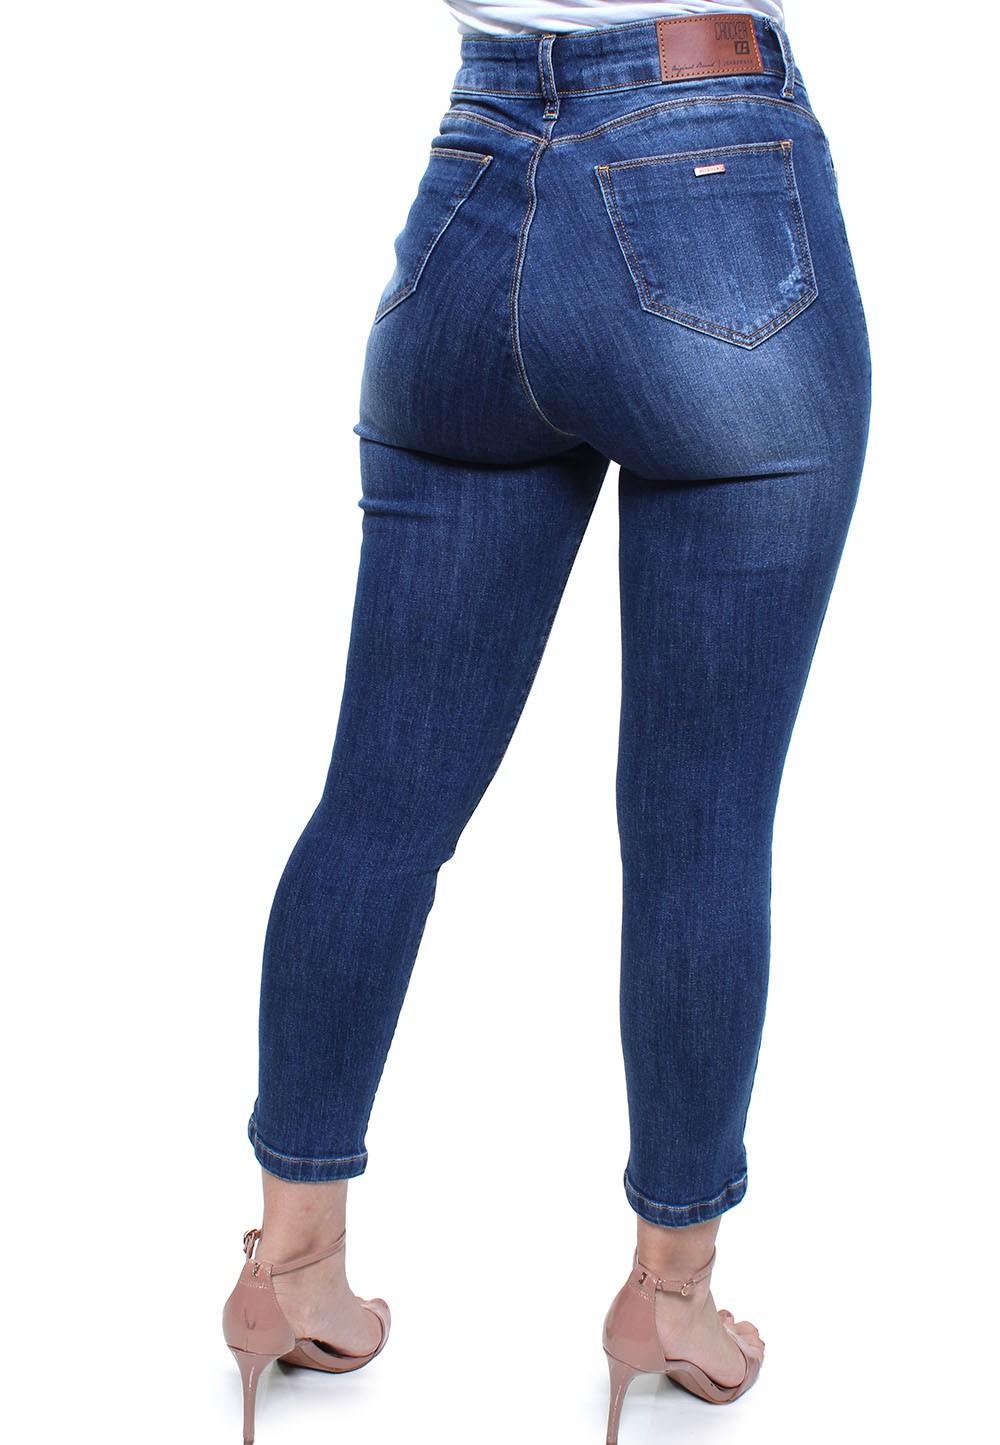 Calça Capri Jeans Feminina Crocker - 47732  - CROCKER JEANS